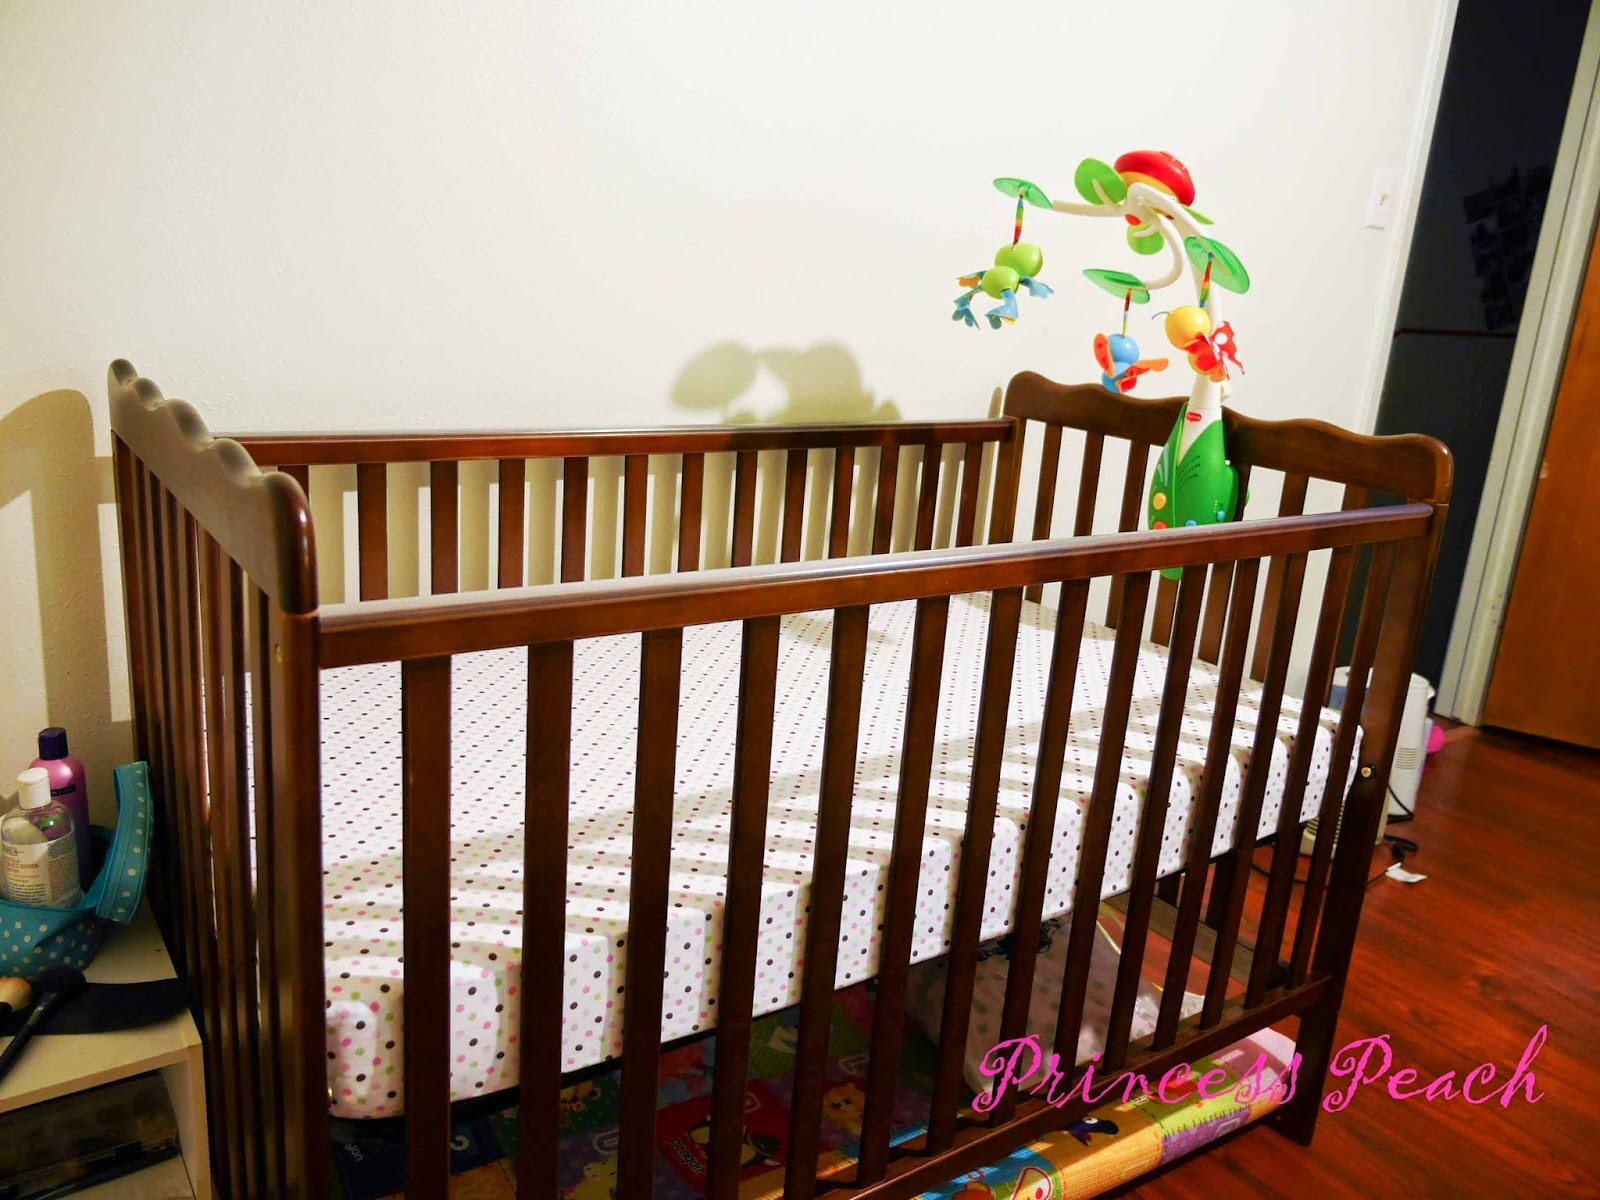 http://twpeach.blogspot.com/2014/11/pregnancy-diary15.html